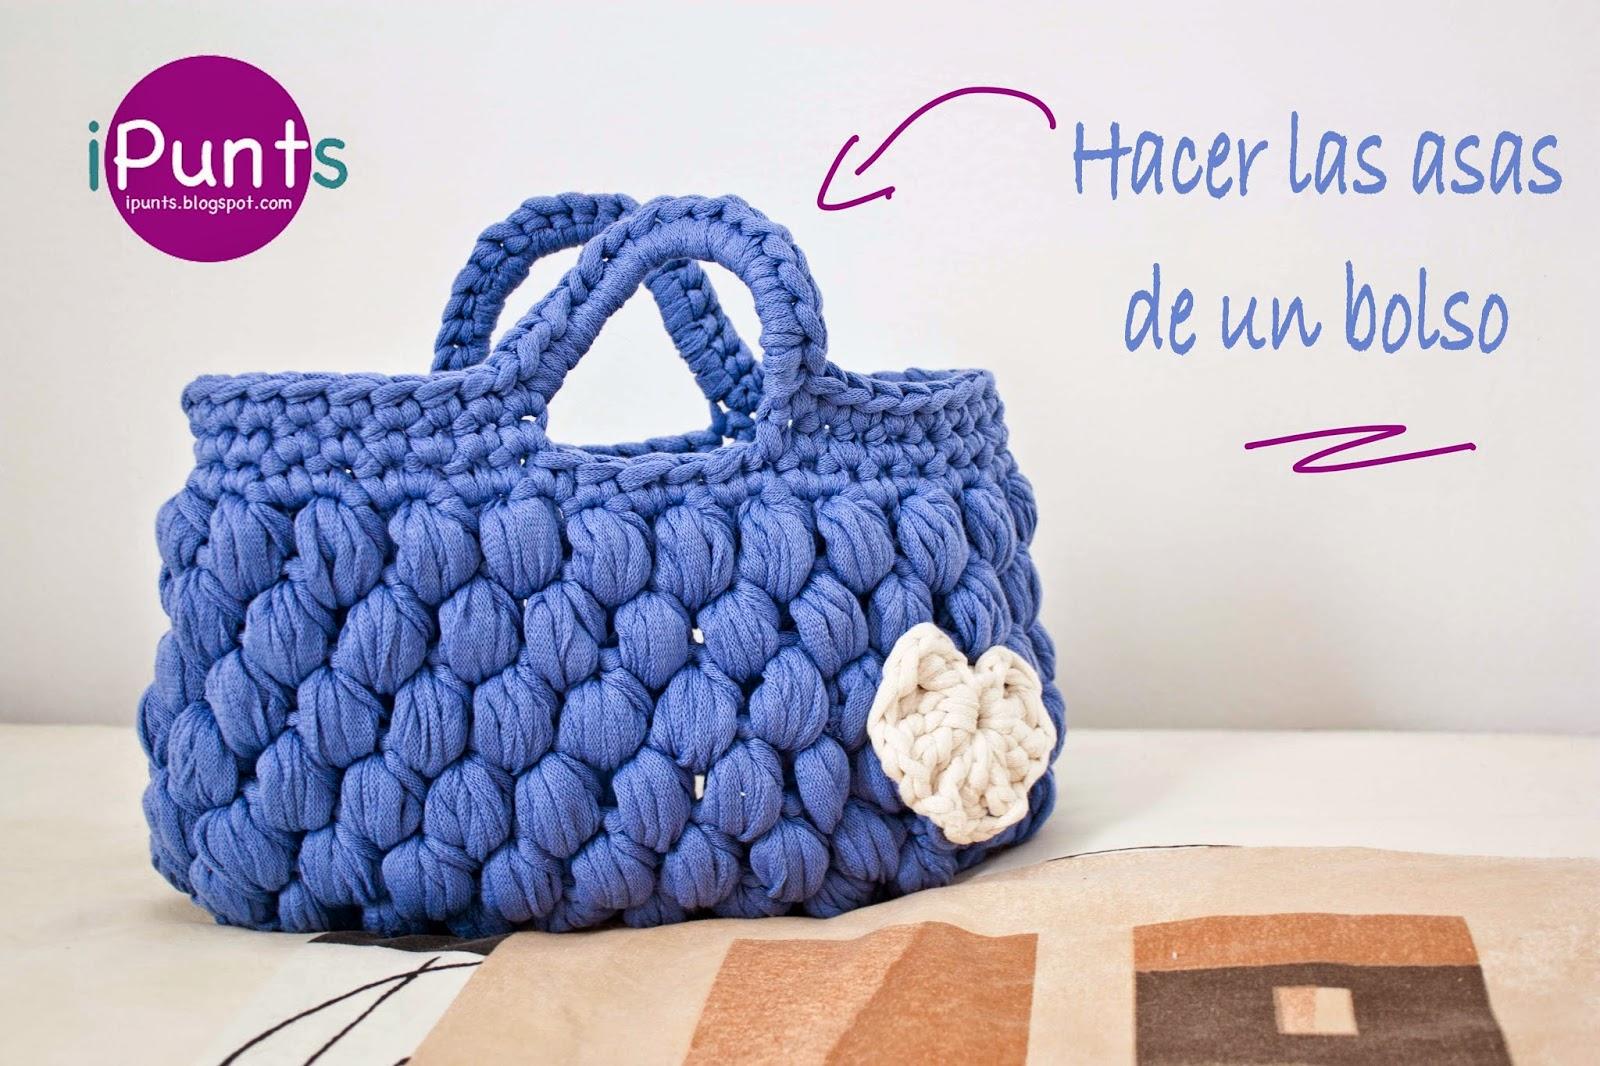 ipunts bolso trapillo crochet asas ganchillo tutorial